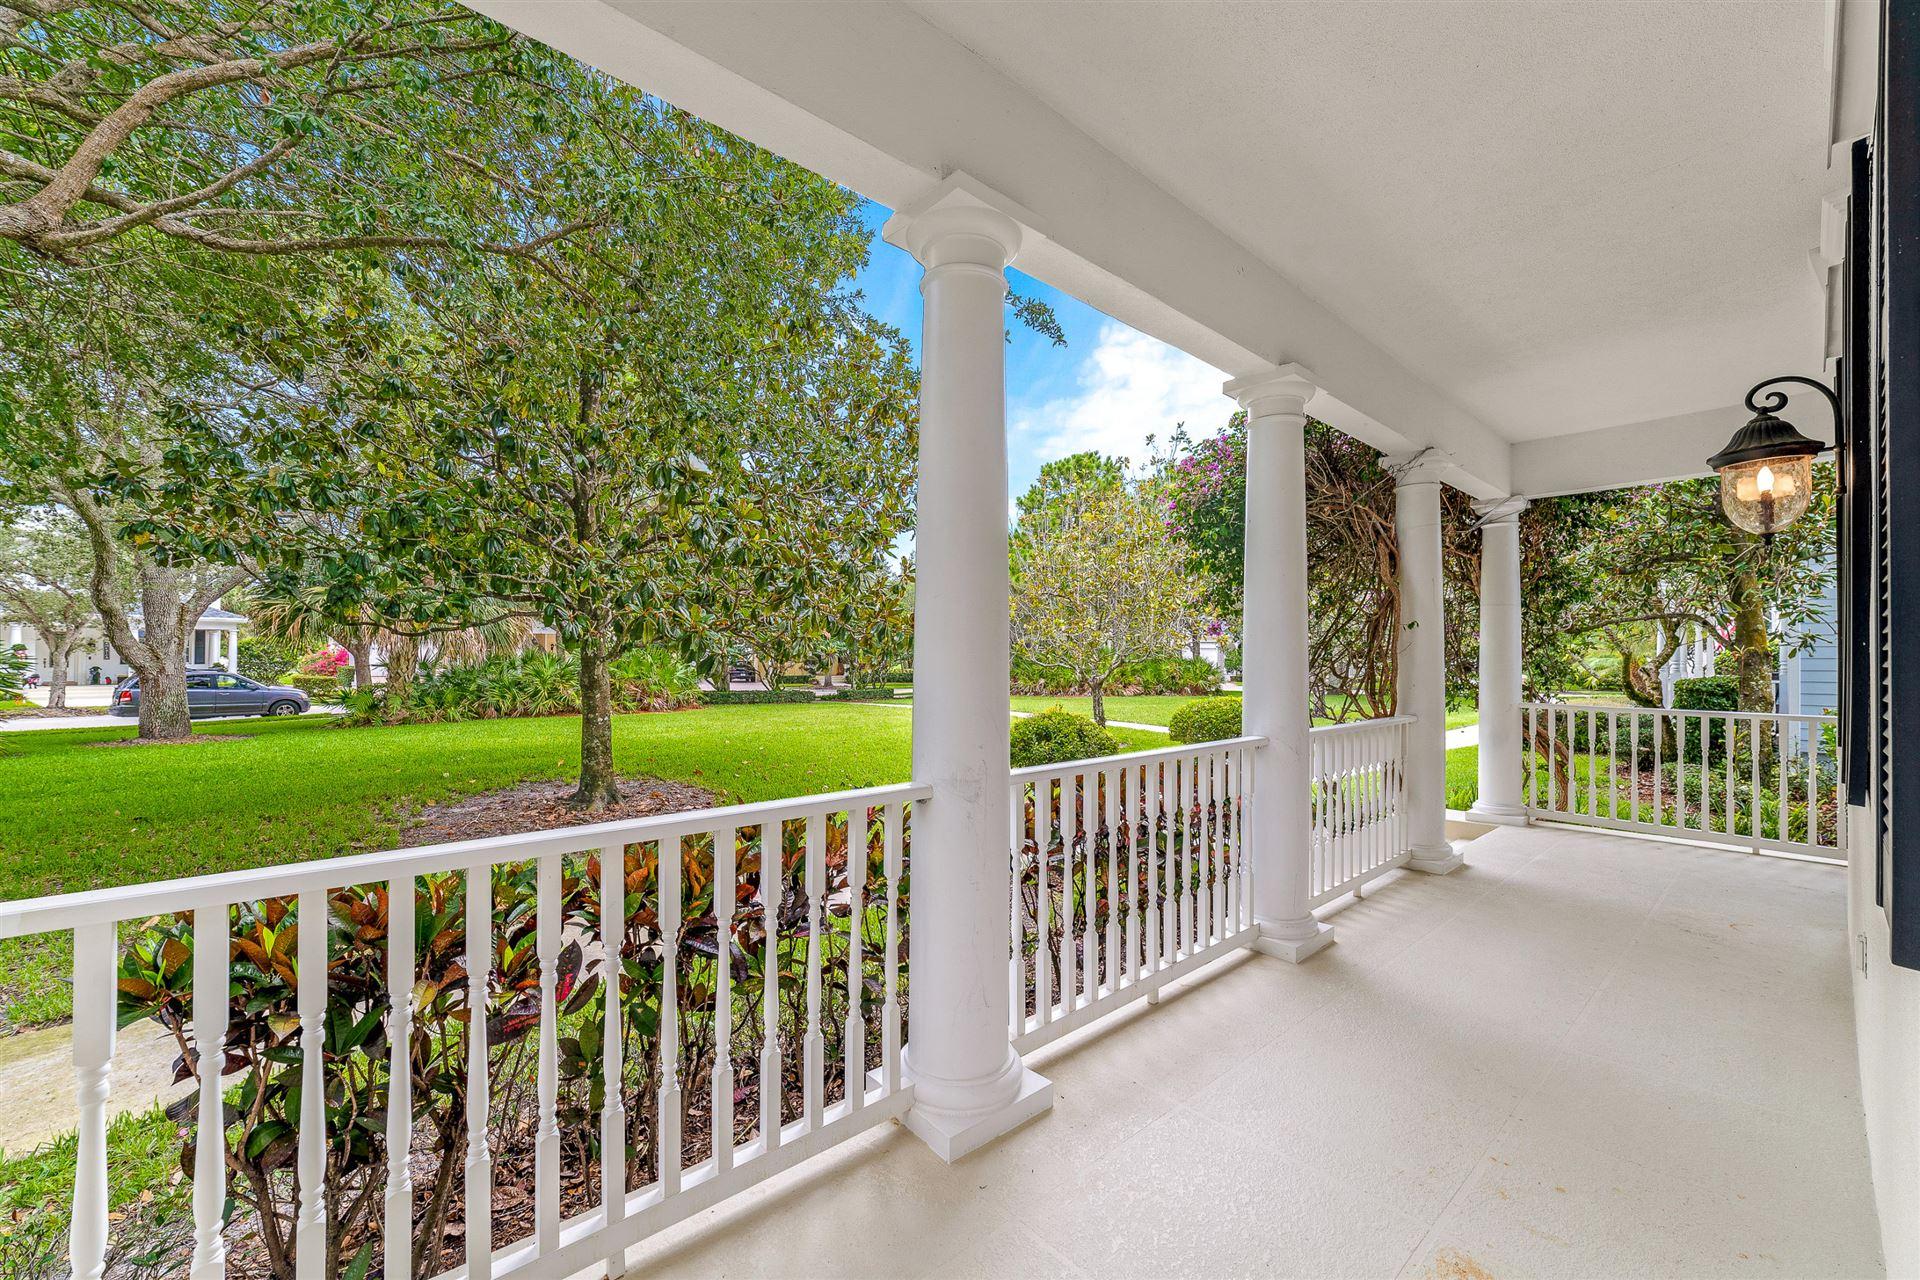 Photo of 241 Barbados Drive, Jupiter, FL 33458 (MLS # RX-10726690)